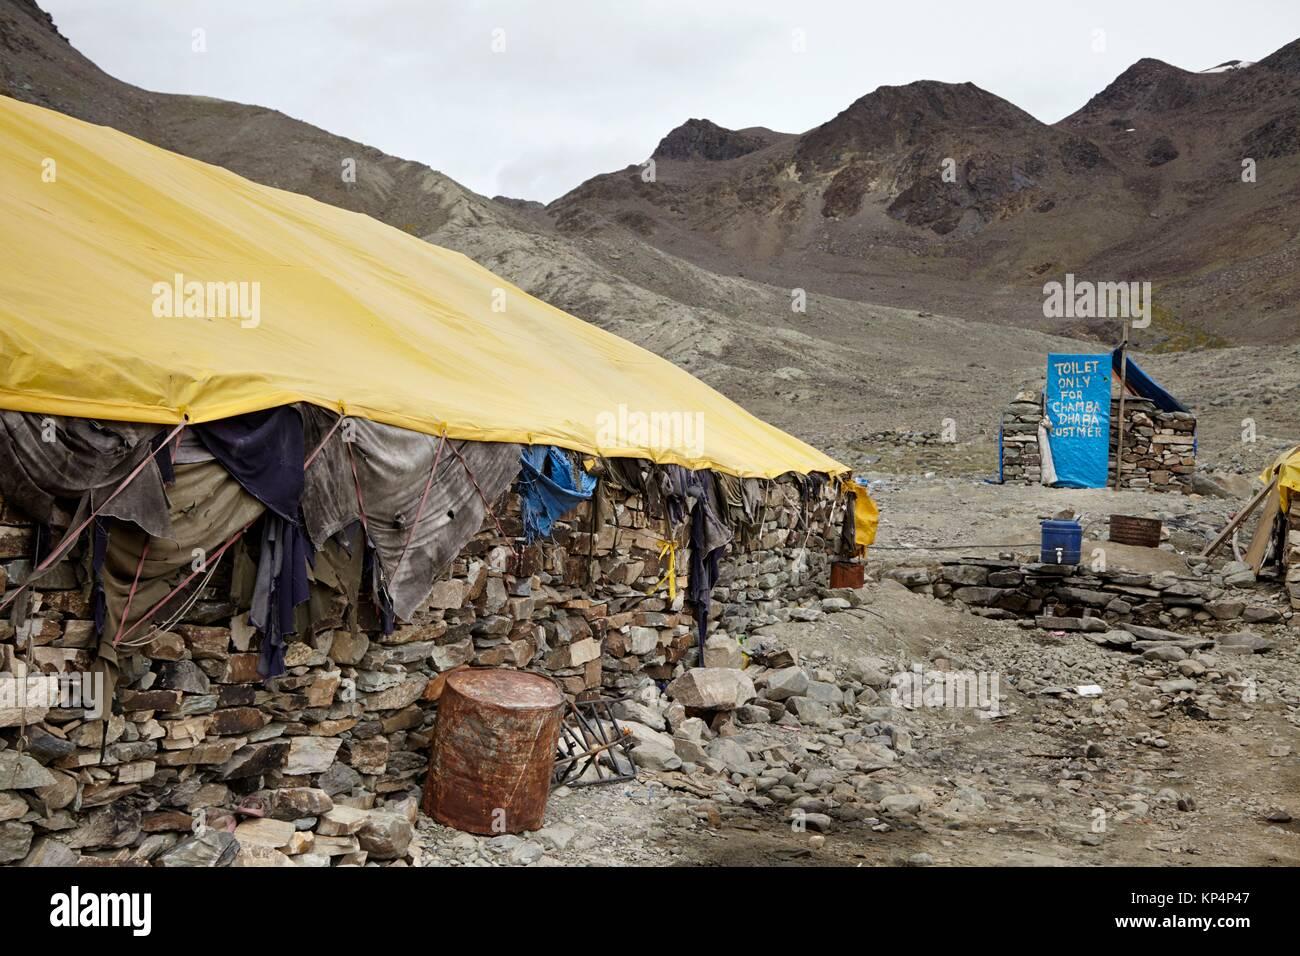 Baratphur Tent Colony, Manali - Leh Highway, Ladak, India. - Stock Image